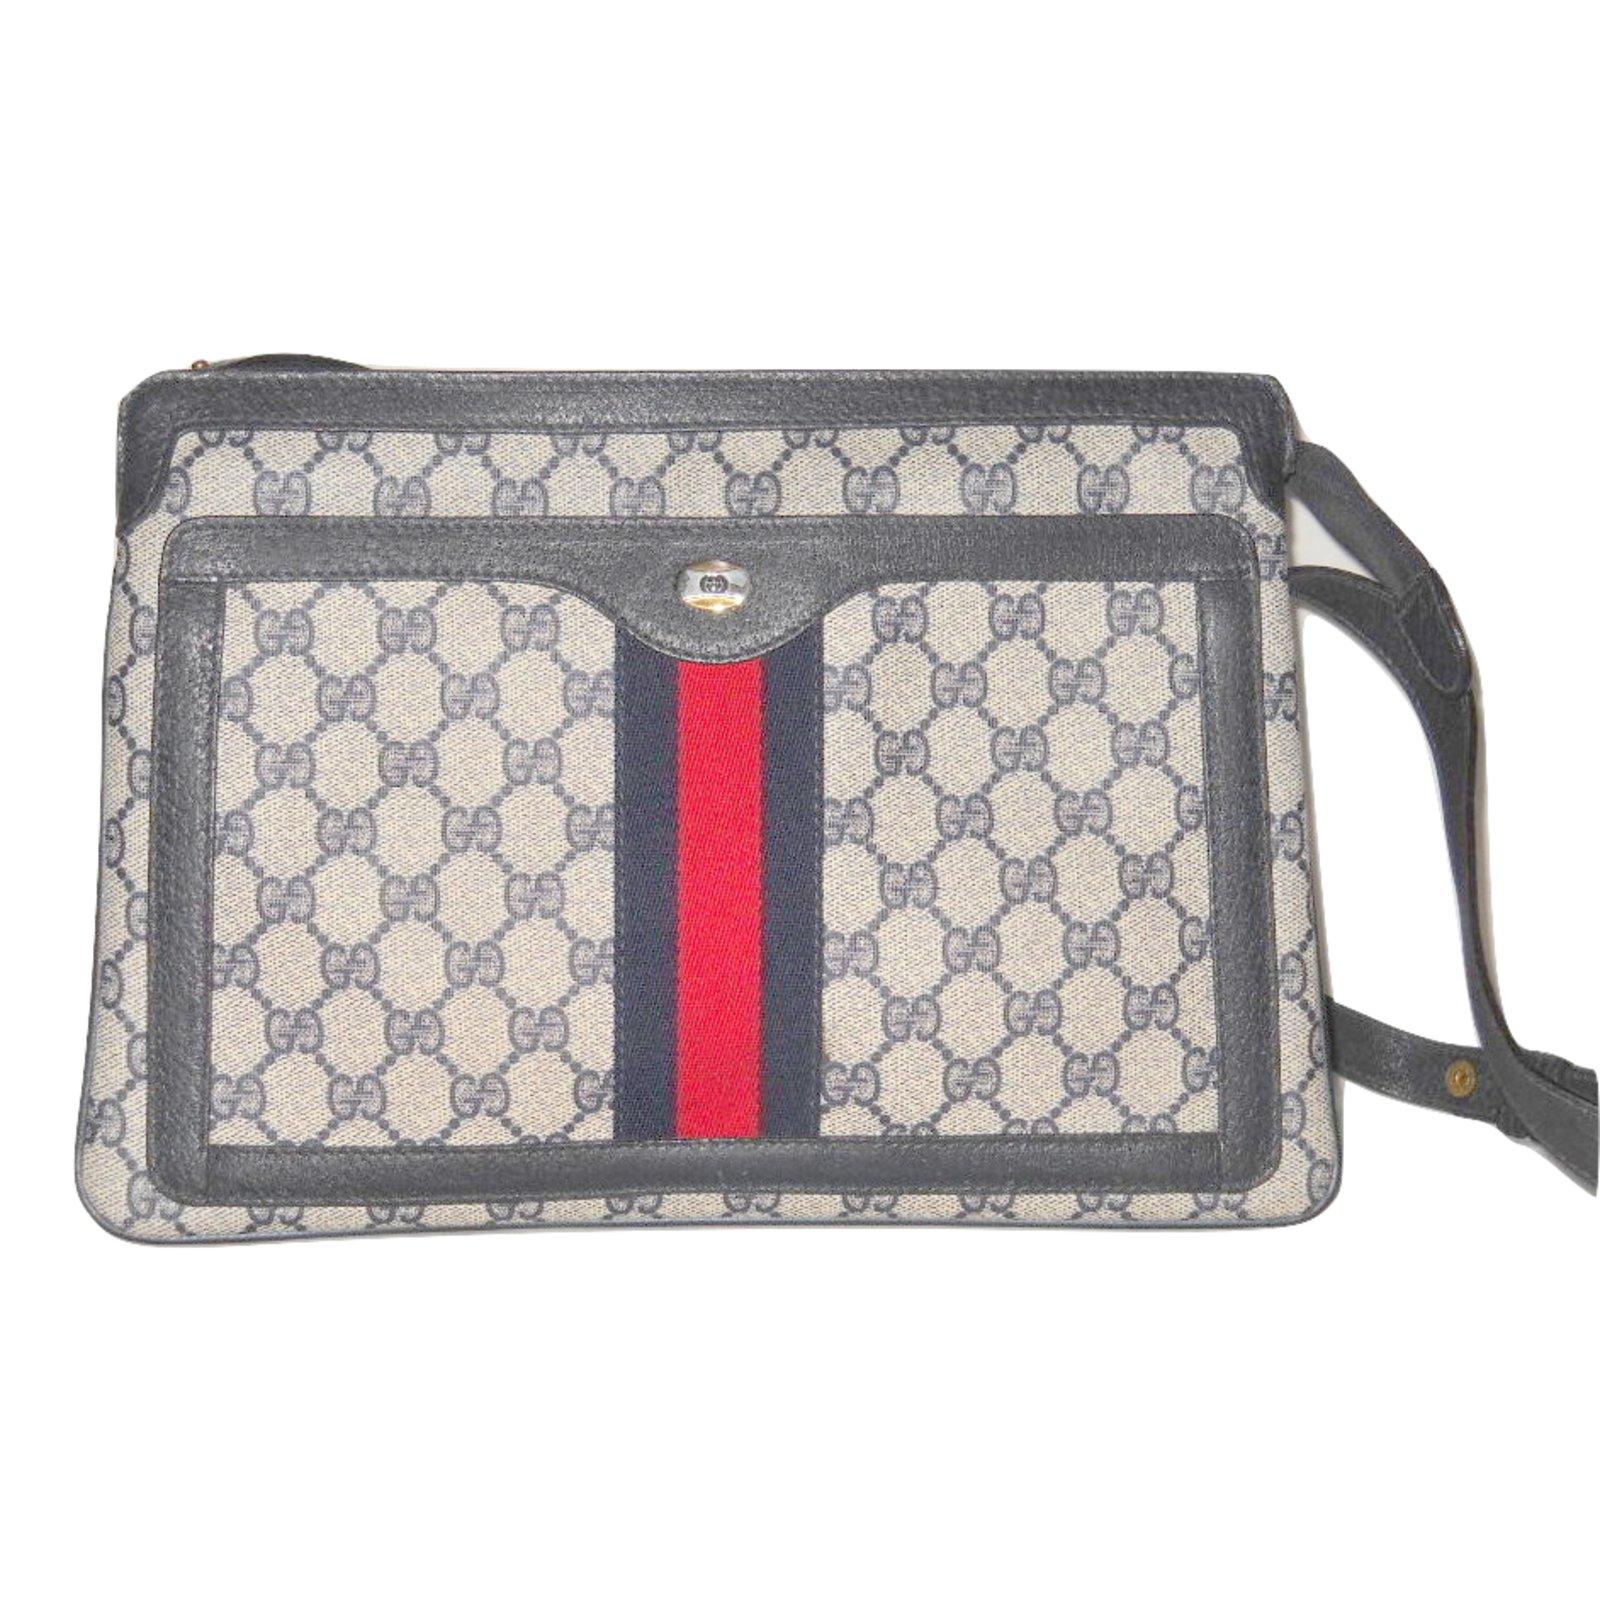 5abece3507b Gucci vintage handbag Handbags Leather